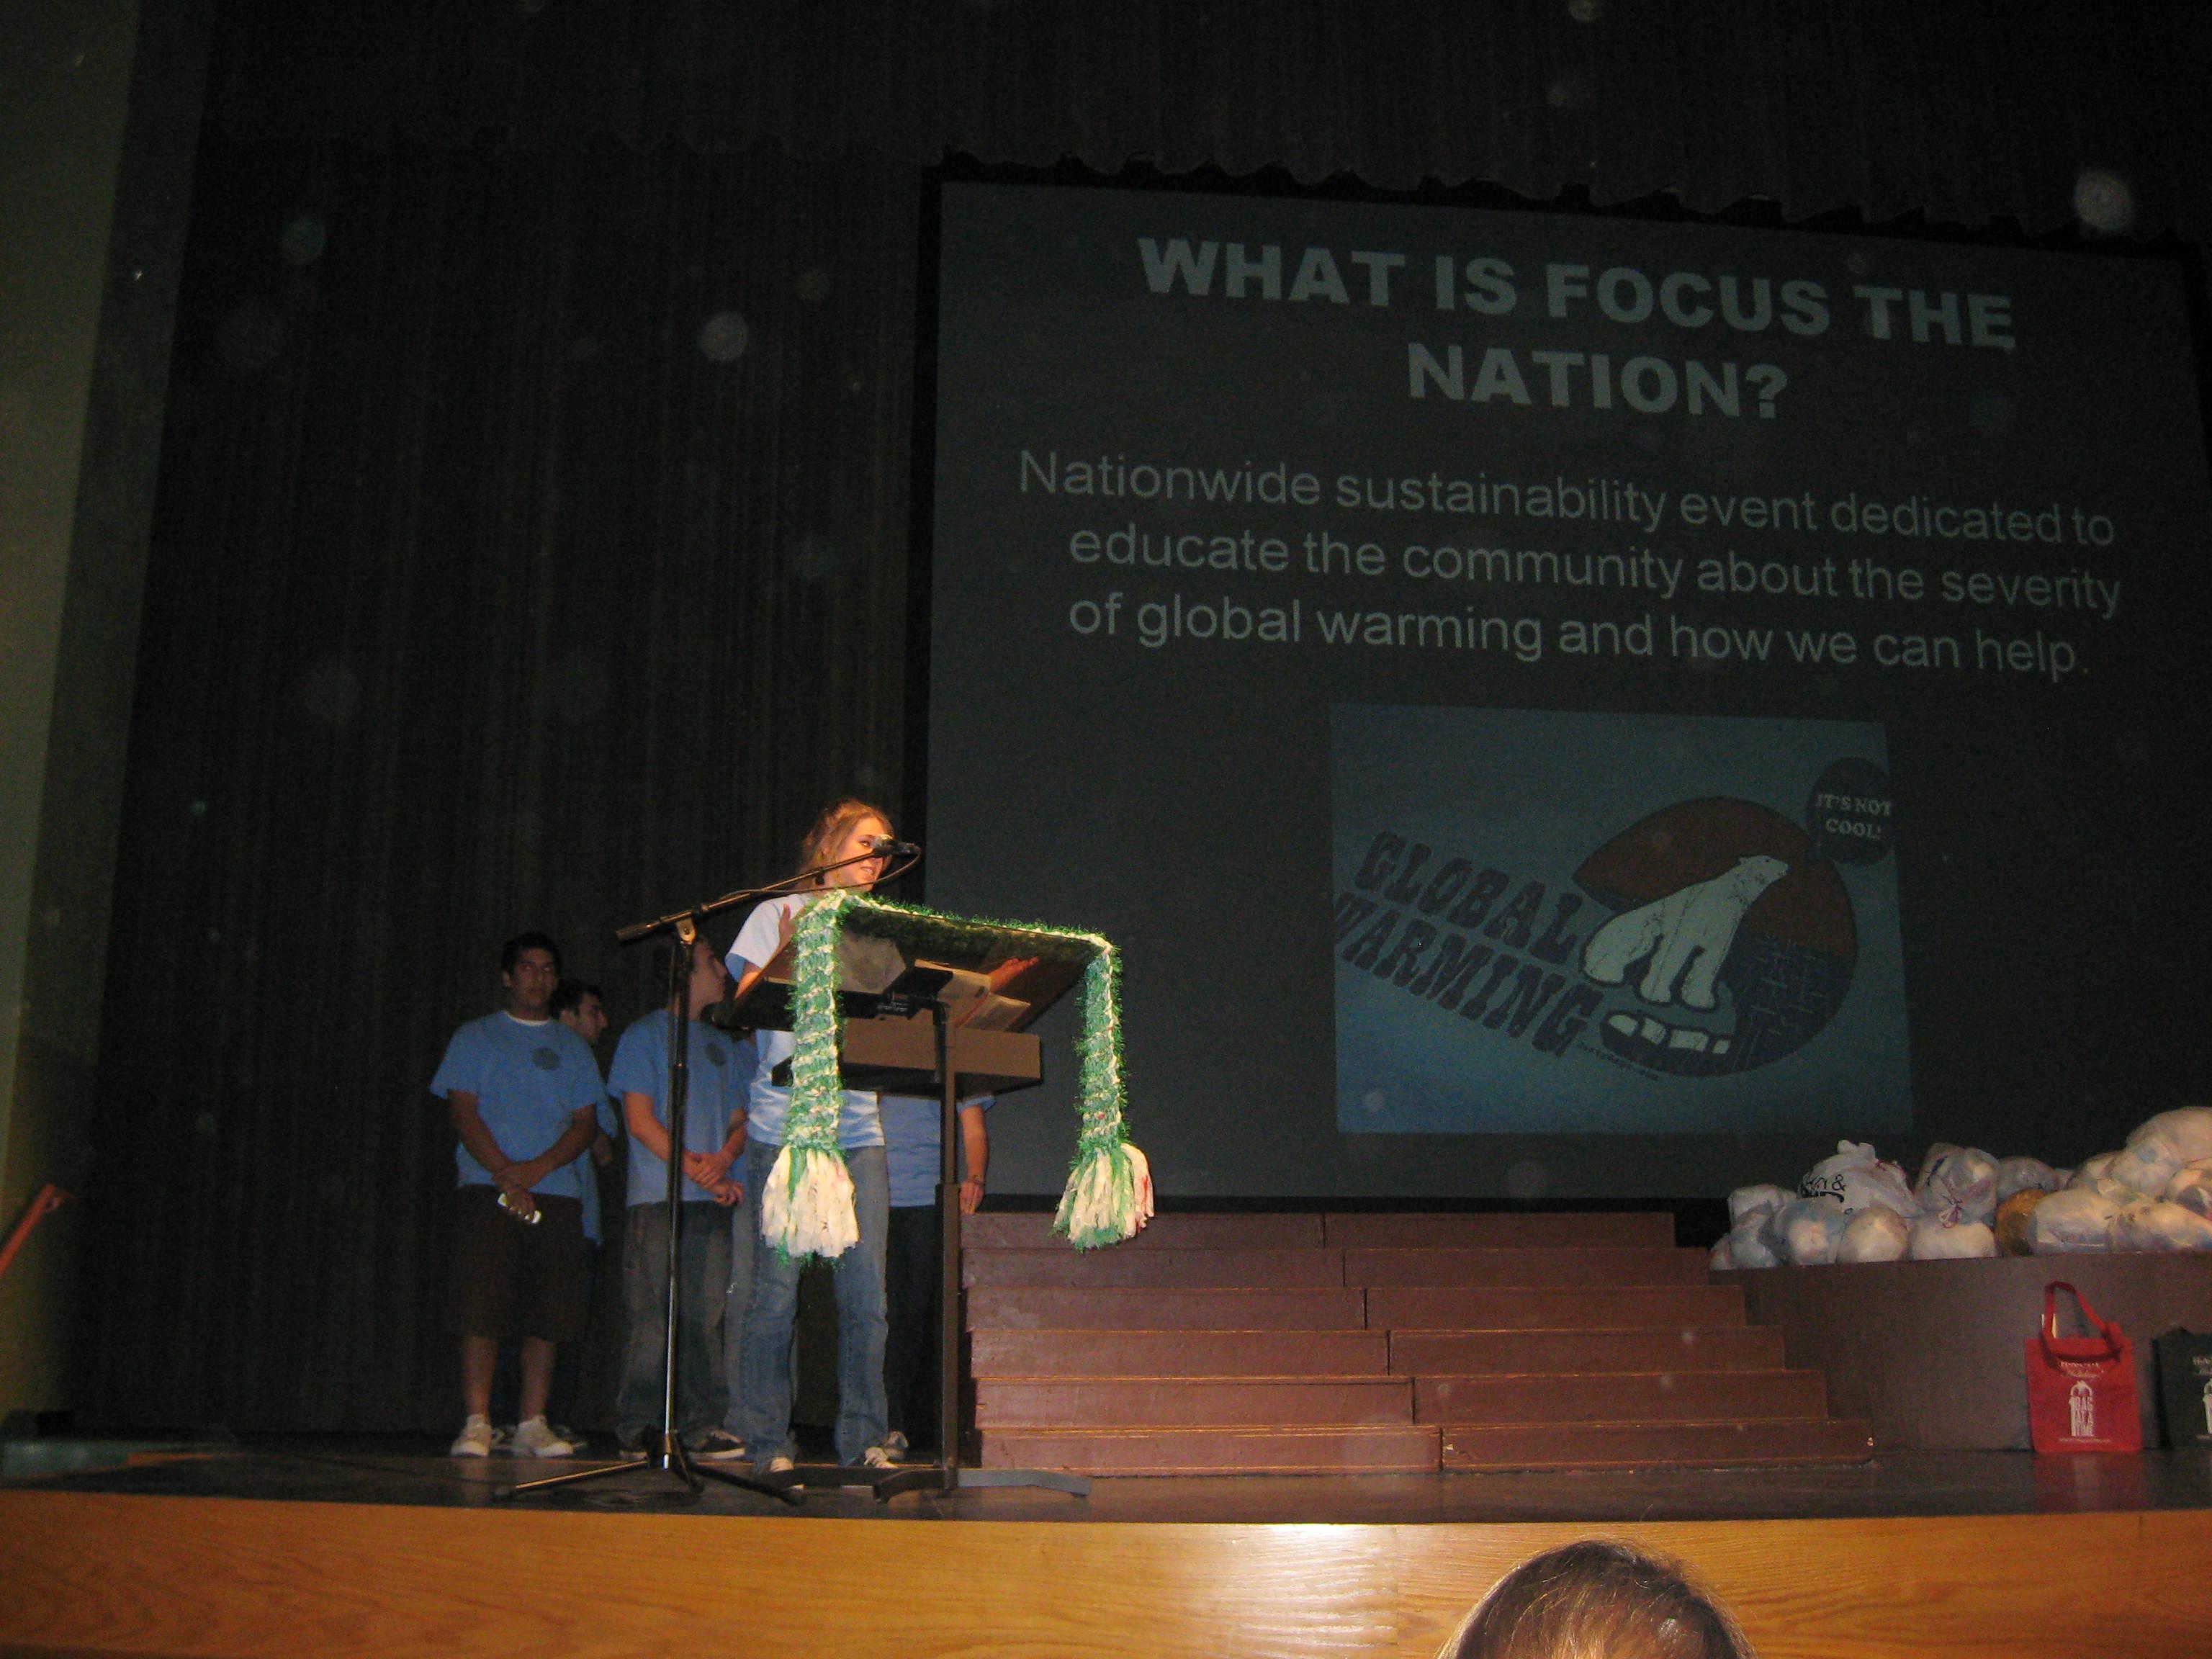 Team Marine opening Focus the Nation Presentation